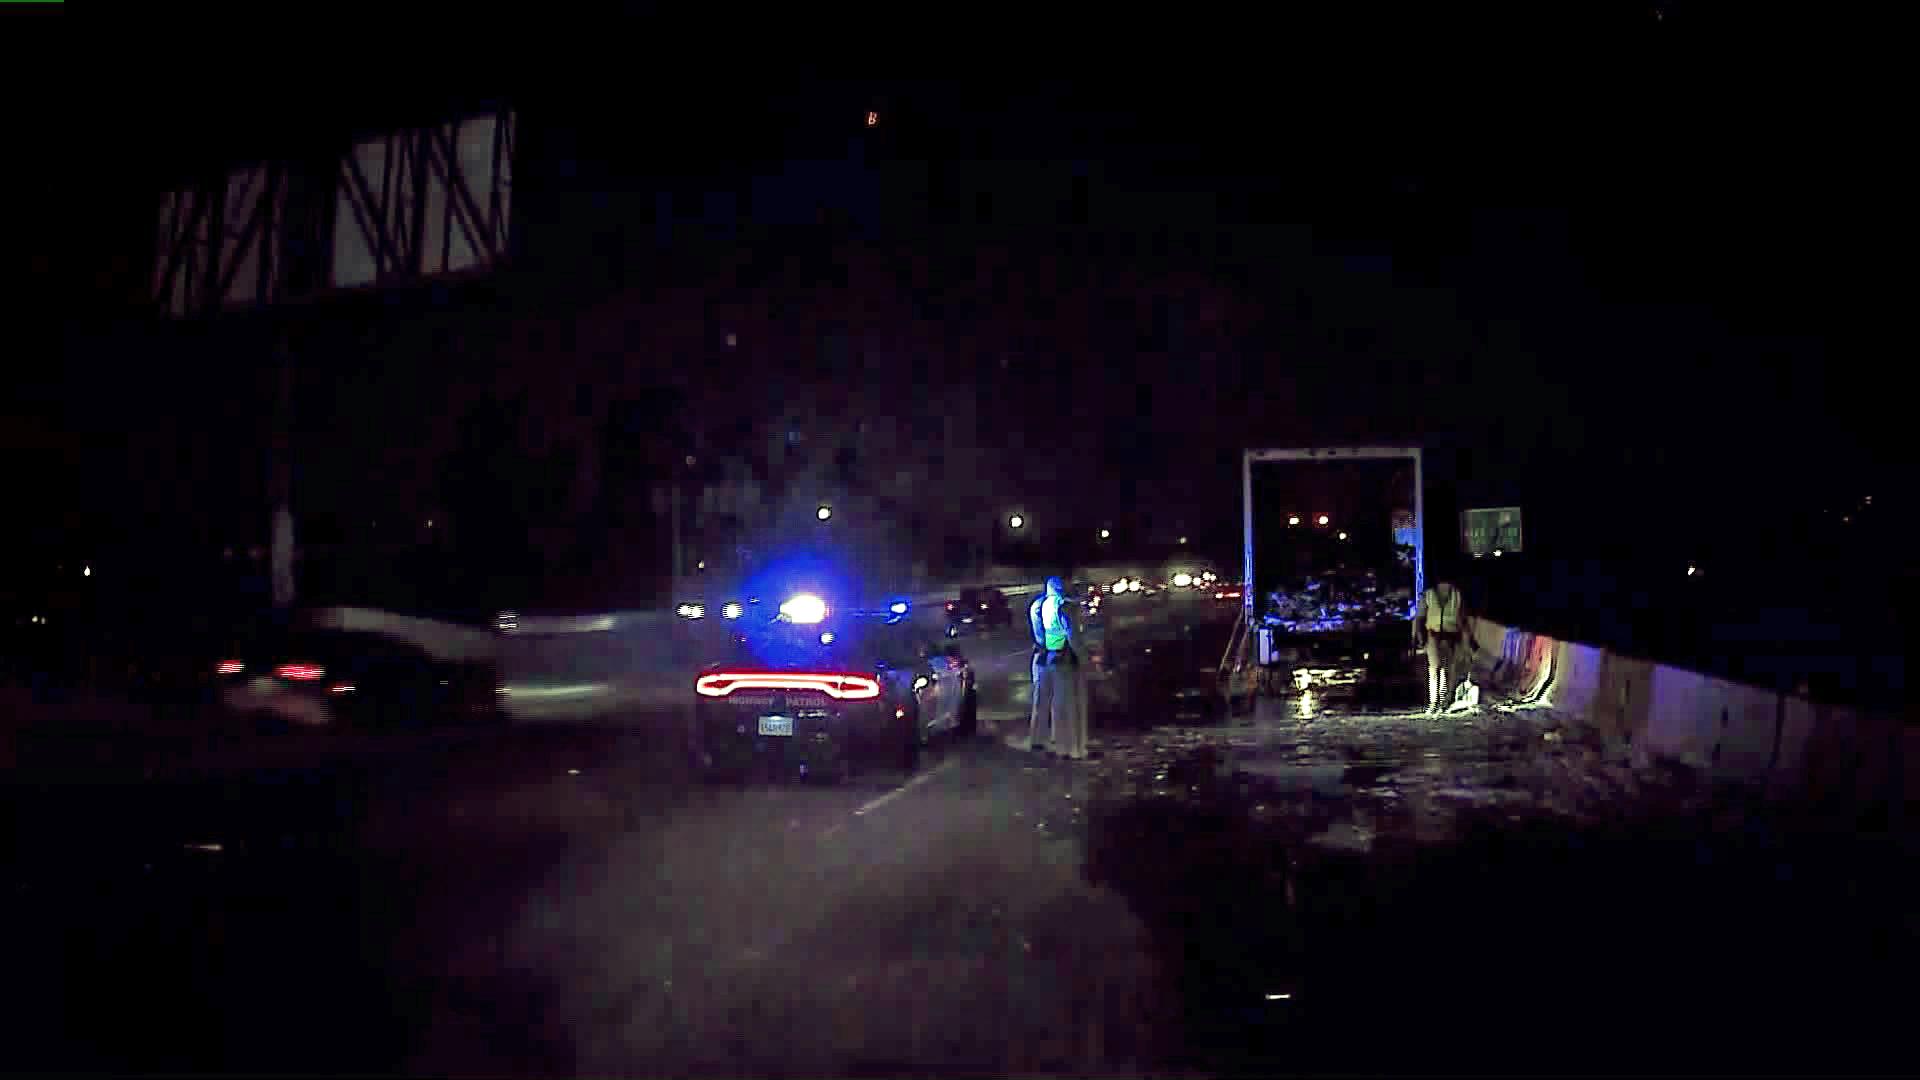 Officers block off 170 Freeway lanes after a truck fire on Jan. 2, 2020. (Credit: KTLA)